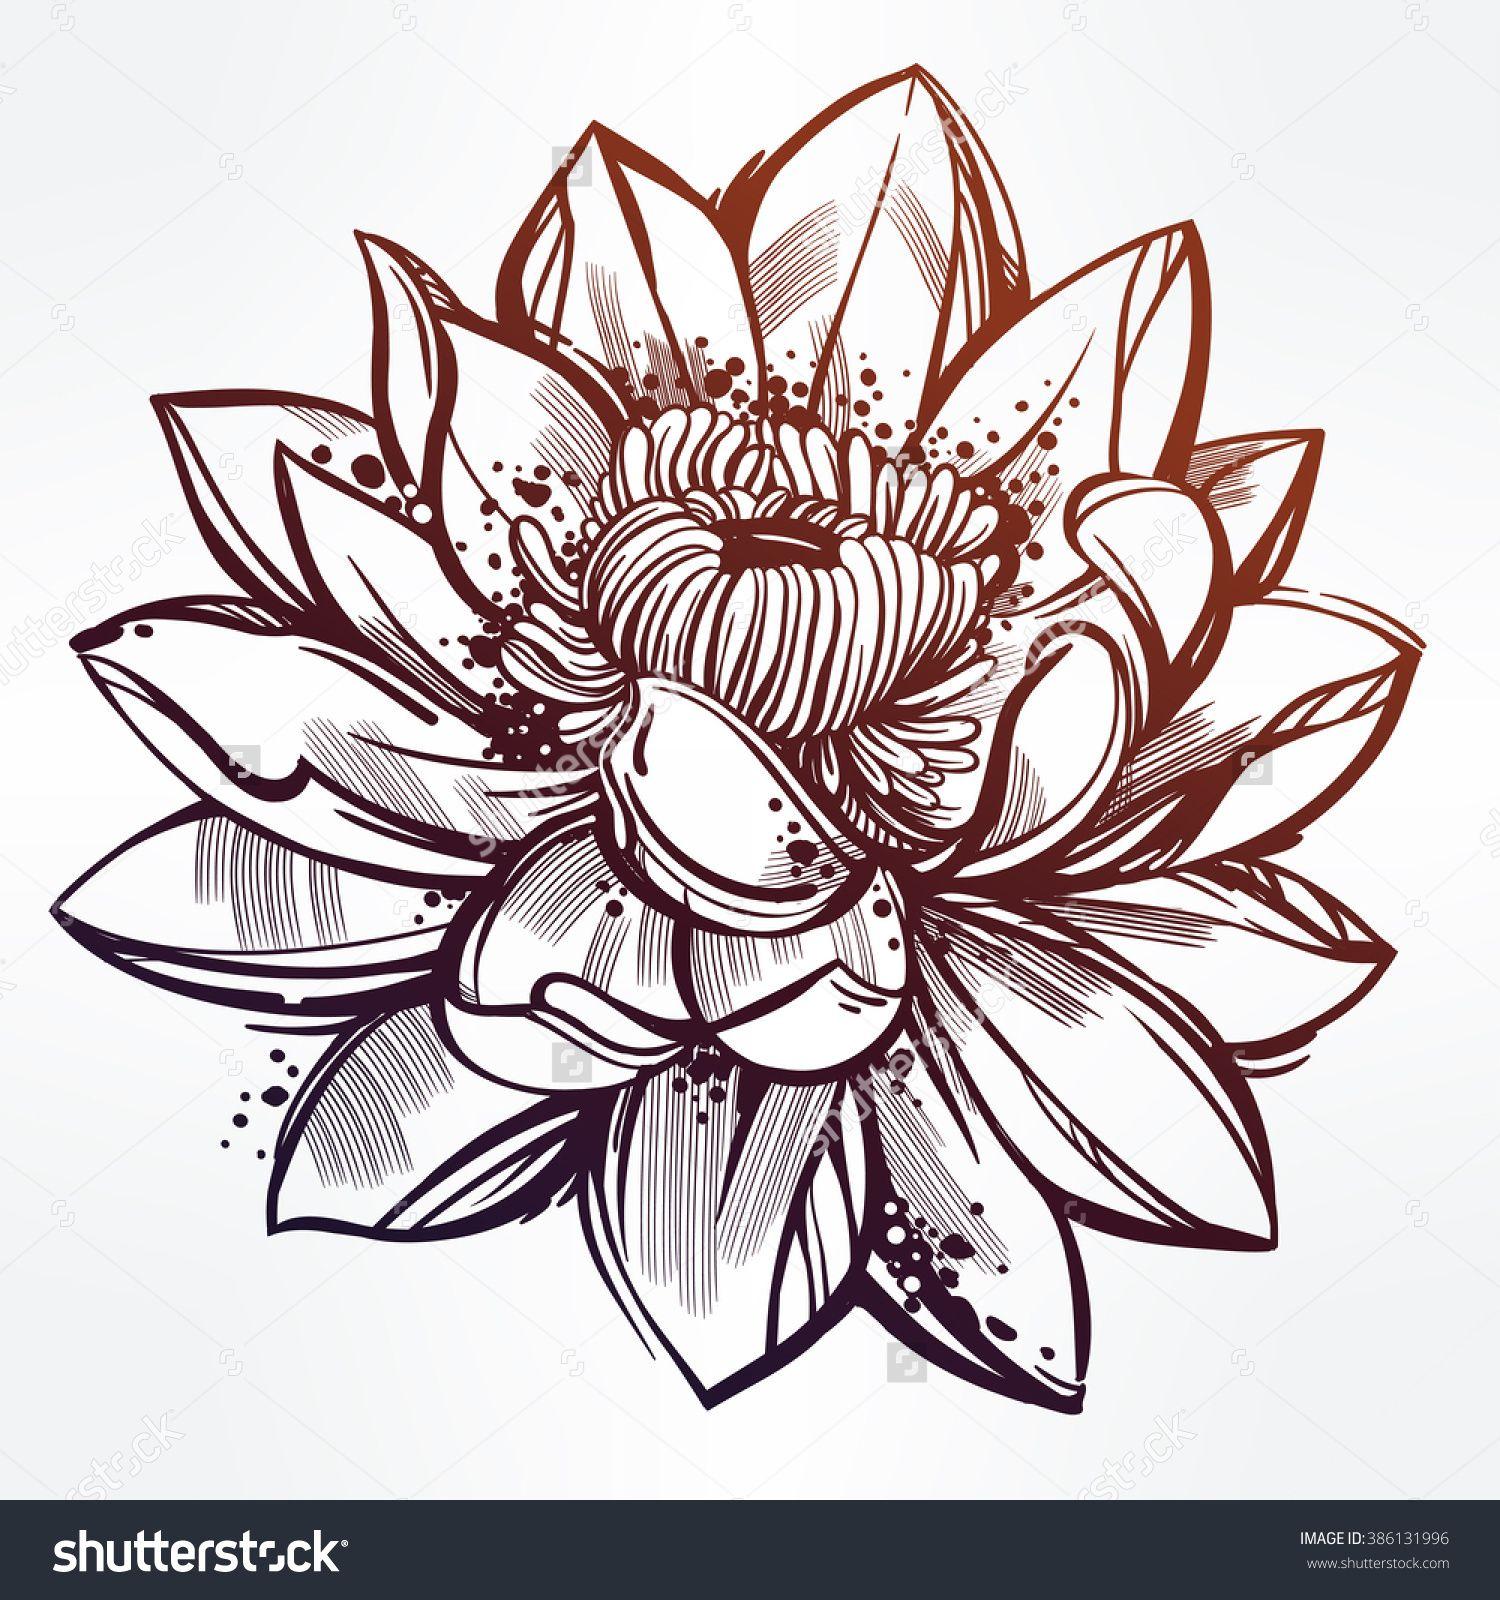 Pin by ella dovey on inkspiration pinterest tattoos flower pin by ella dovey on inkspiration pinterest tattoos flower tattoo designs and tattoo designs izmirmasajfo